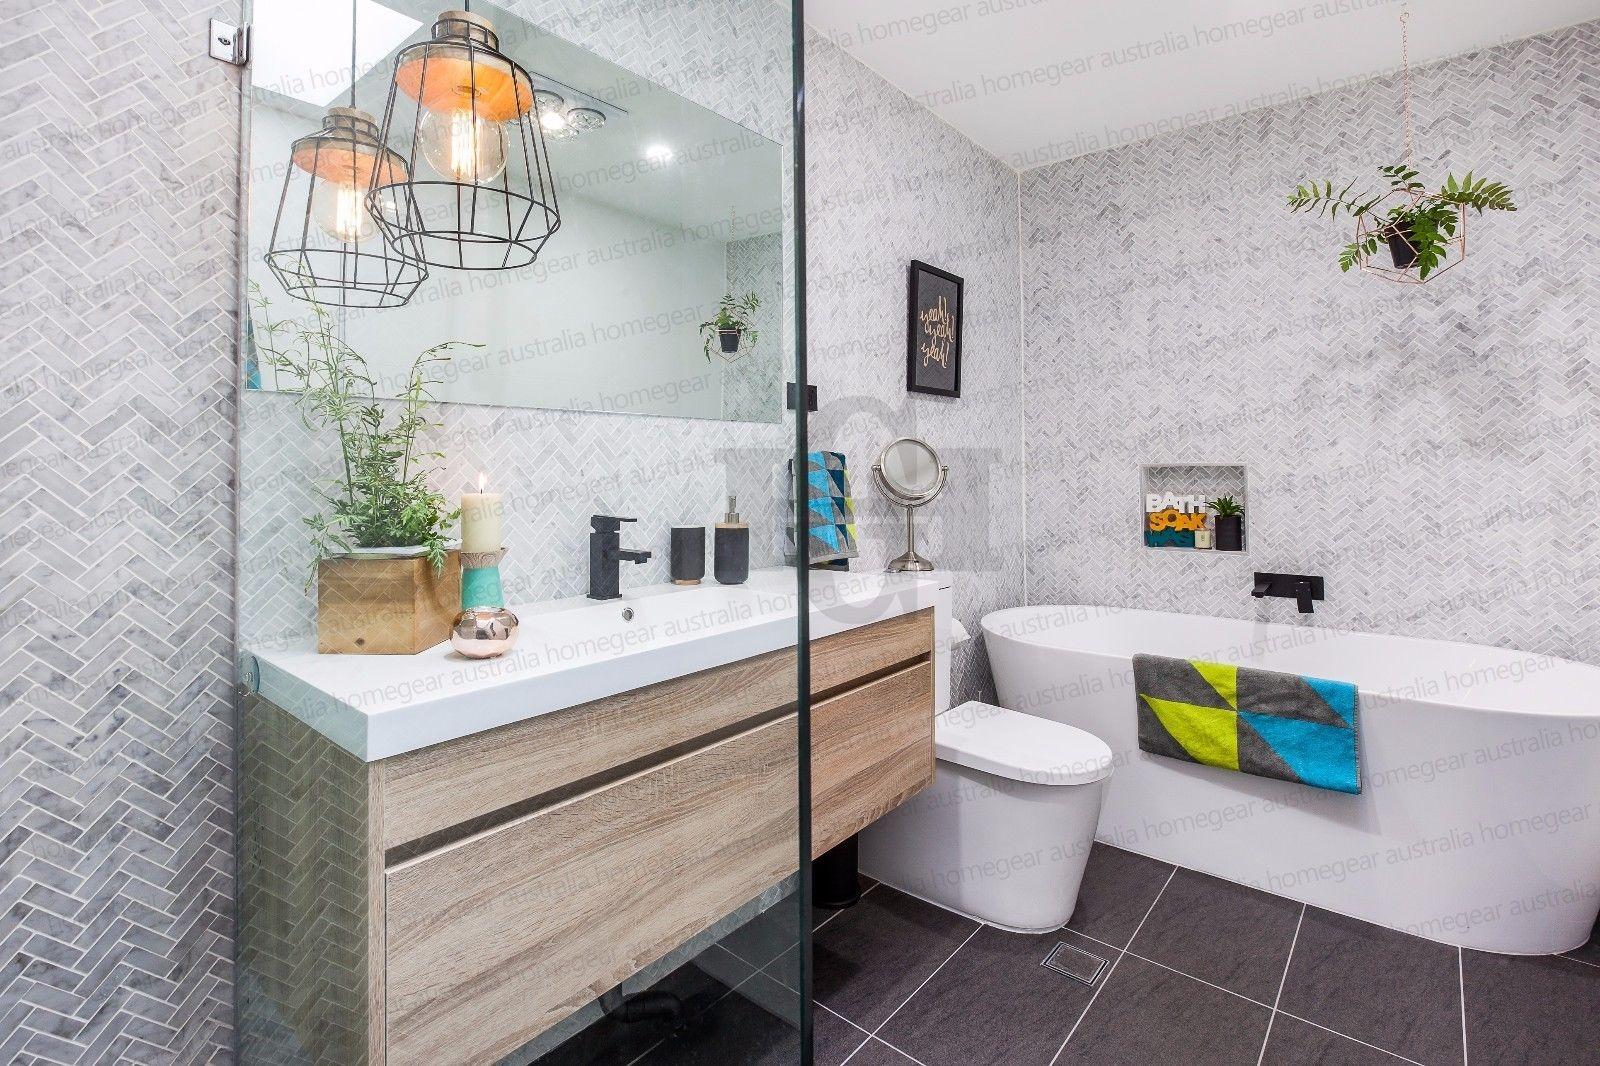 Bronte Round Oval Freestanding Lucite 174 Acrylic Bath Tub